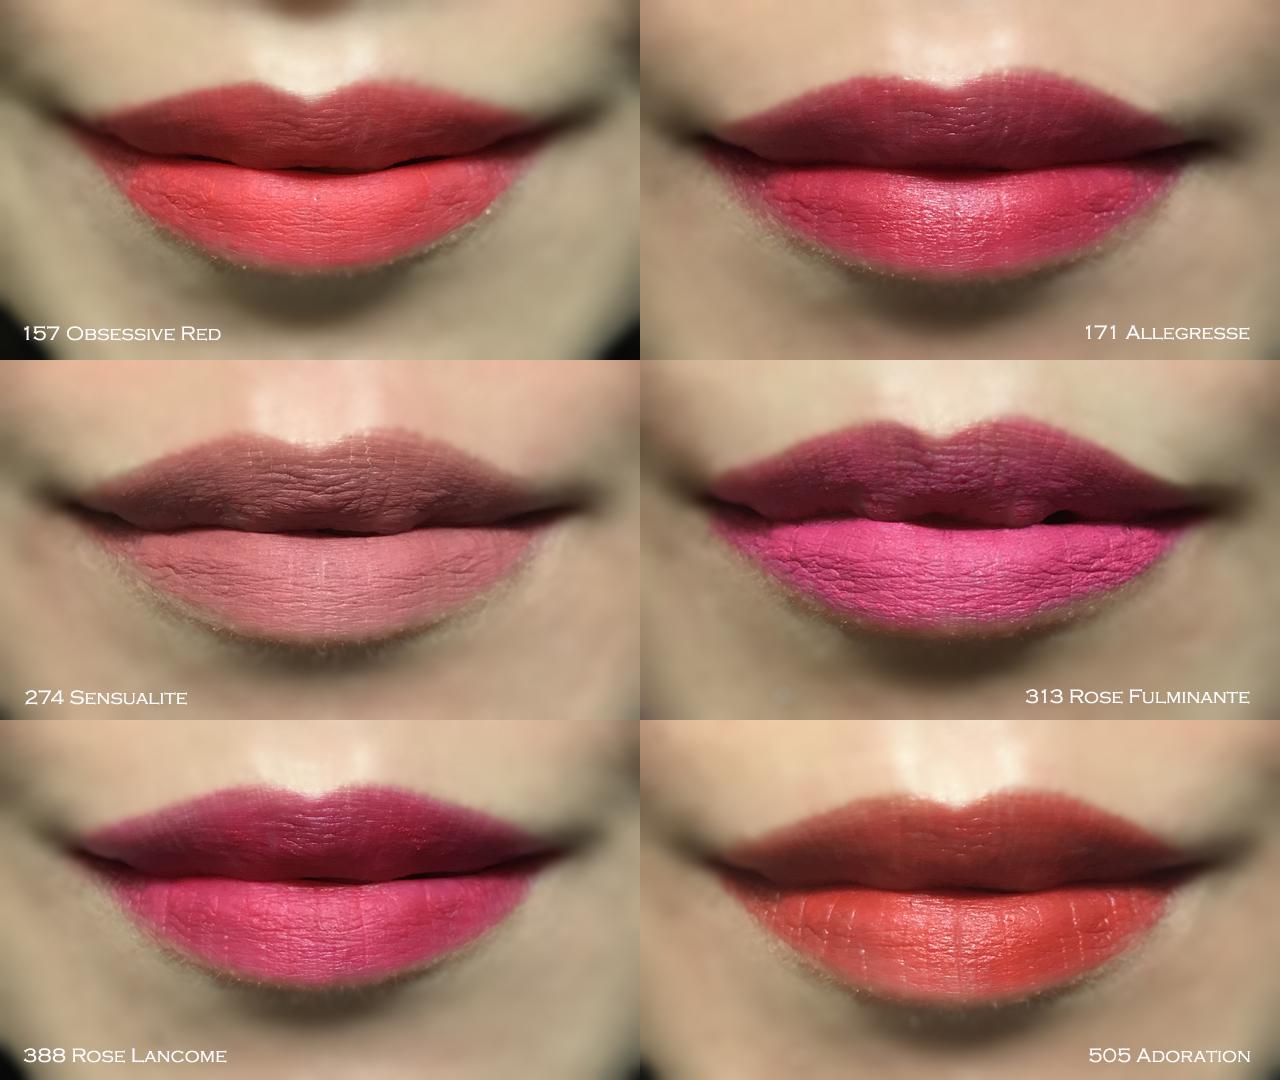 Lancome L'Absolu Rouge Drama Matte lip swatches